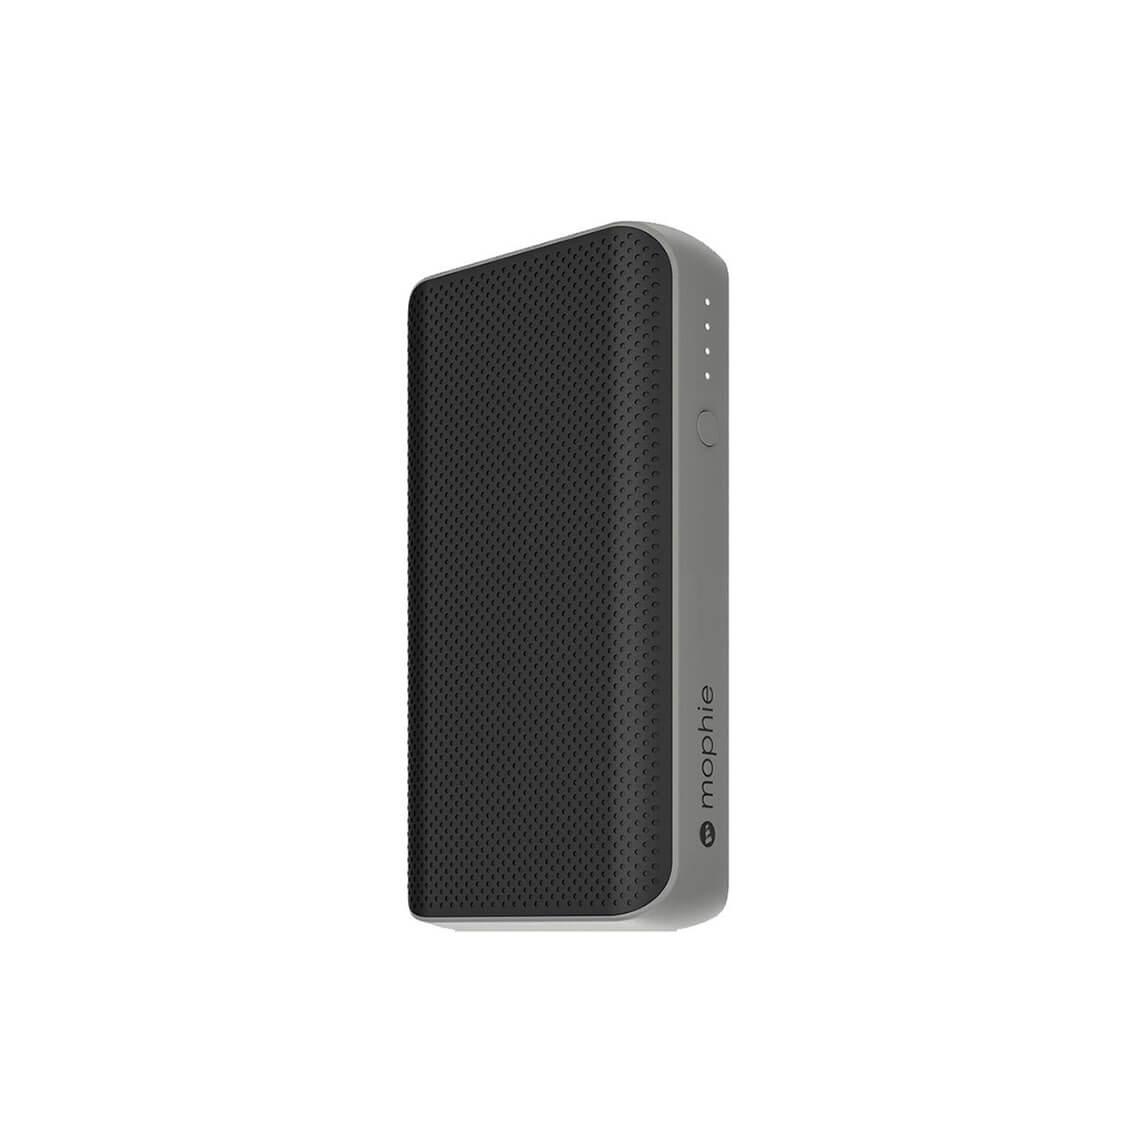 پاور بانک سریع موفی مدل Powerstation PD XL